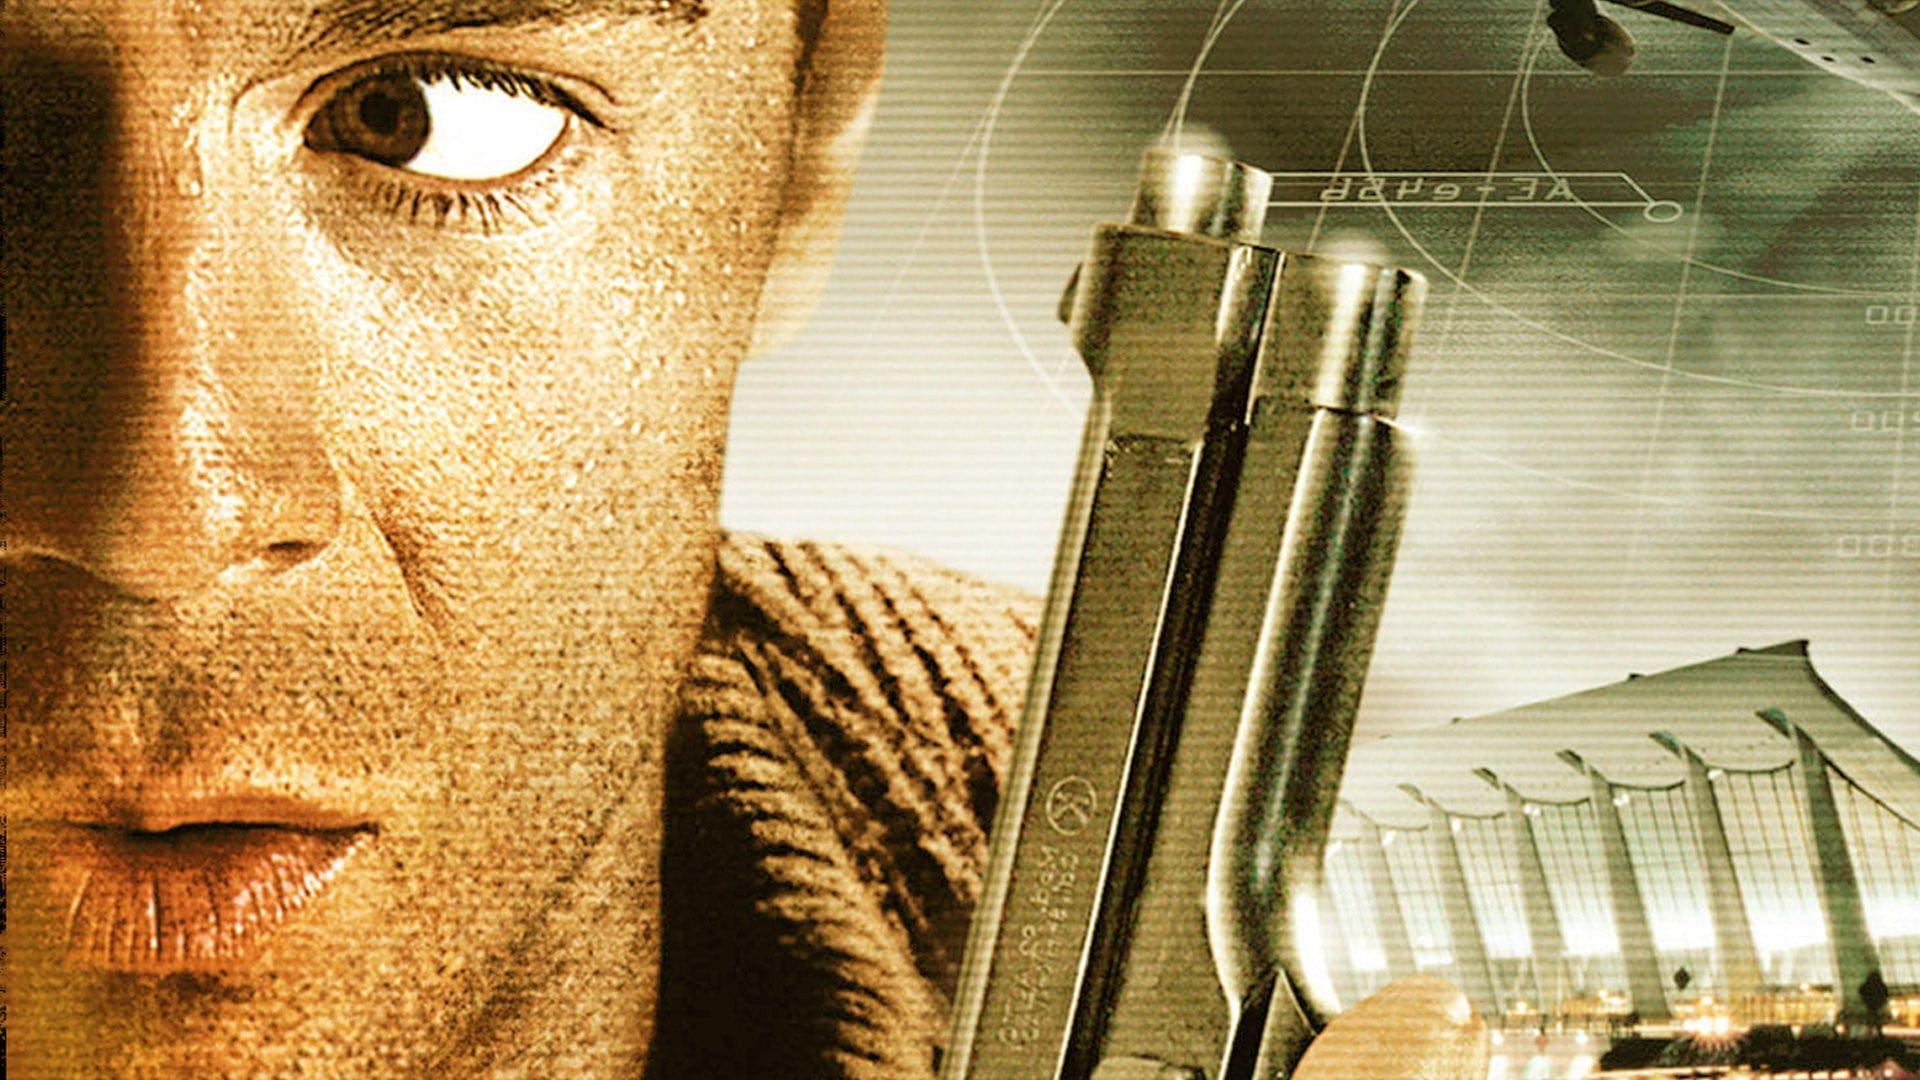 Hd Mozi Die Hard 2 Meg Dragabb Az Eleted 1990 Teljes Film Magyarul Online Hd Hu Mozi Die Full Movies Online Free Free Movies Online Full Movies Online